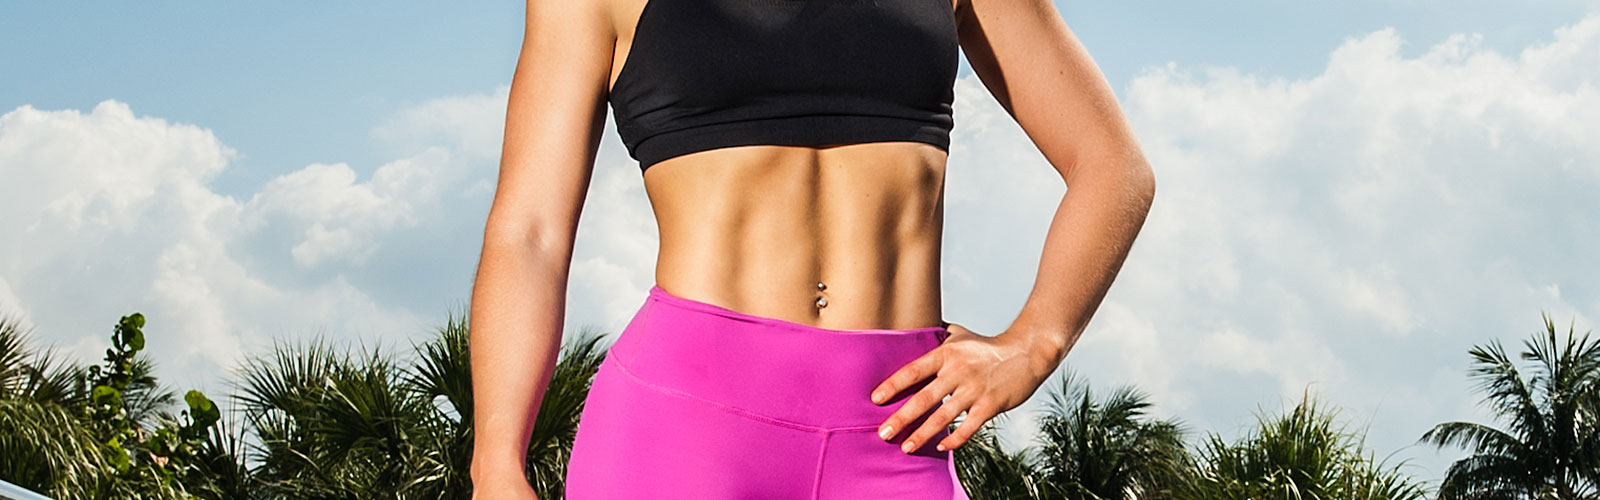 Katie Sonier - Blog - Fitness Motivation